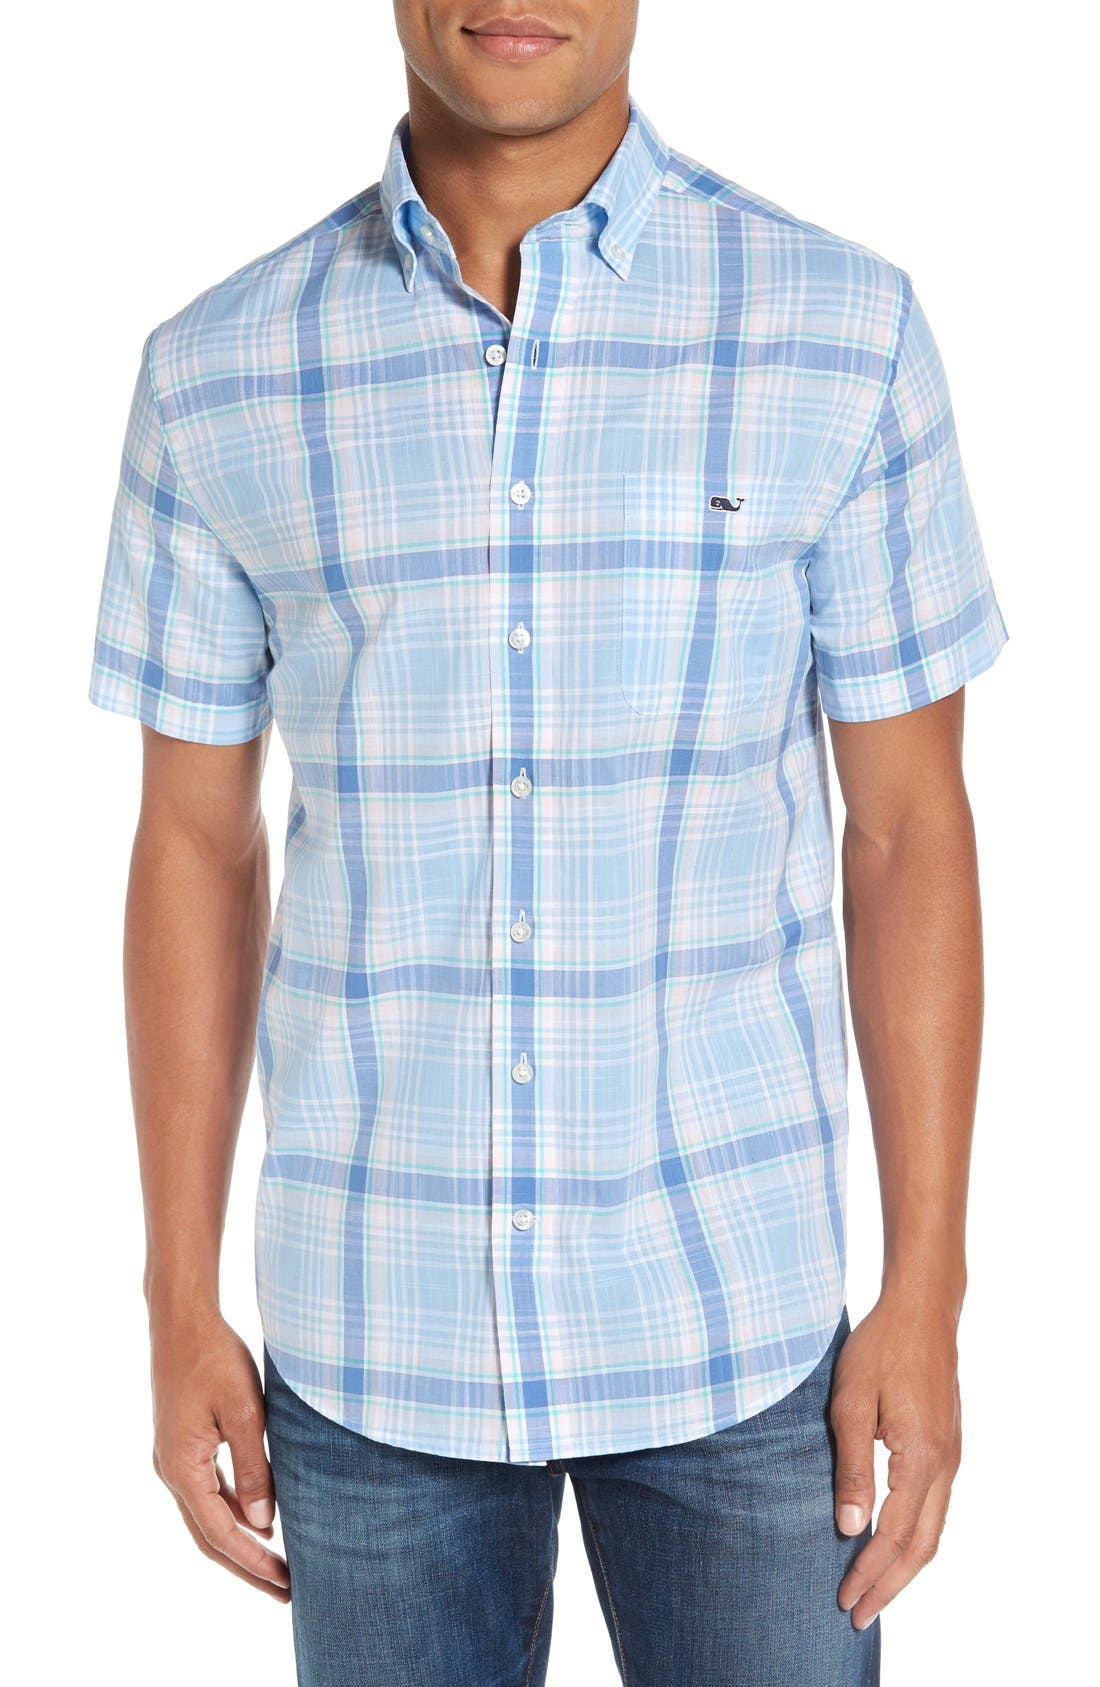 Alternate Image 1 Selected - Vineyard Vines 'Hamblin - Tucker' Regular Fit Plaid Sport Shirt